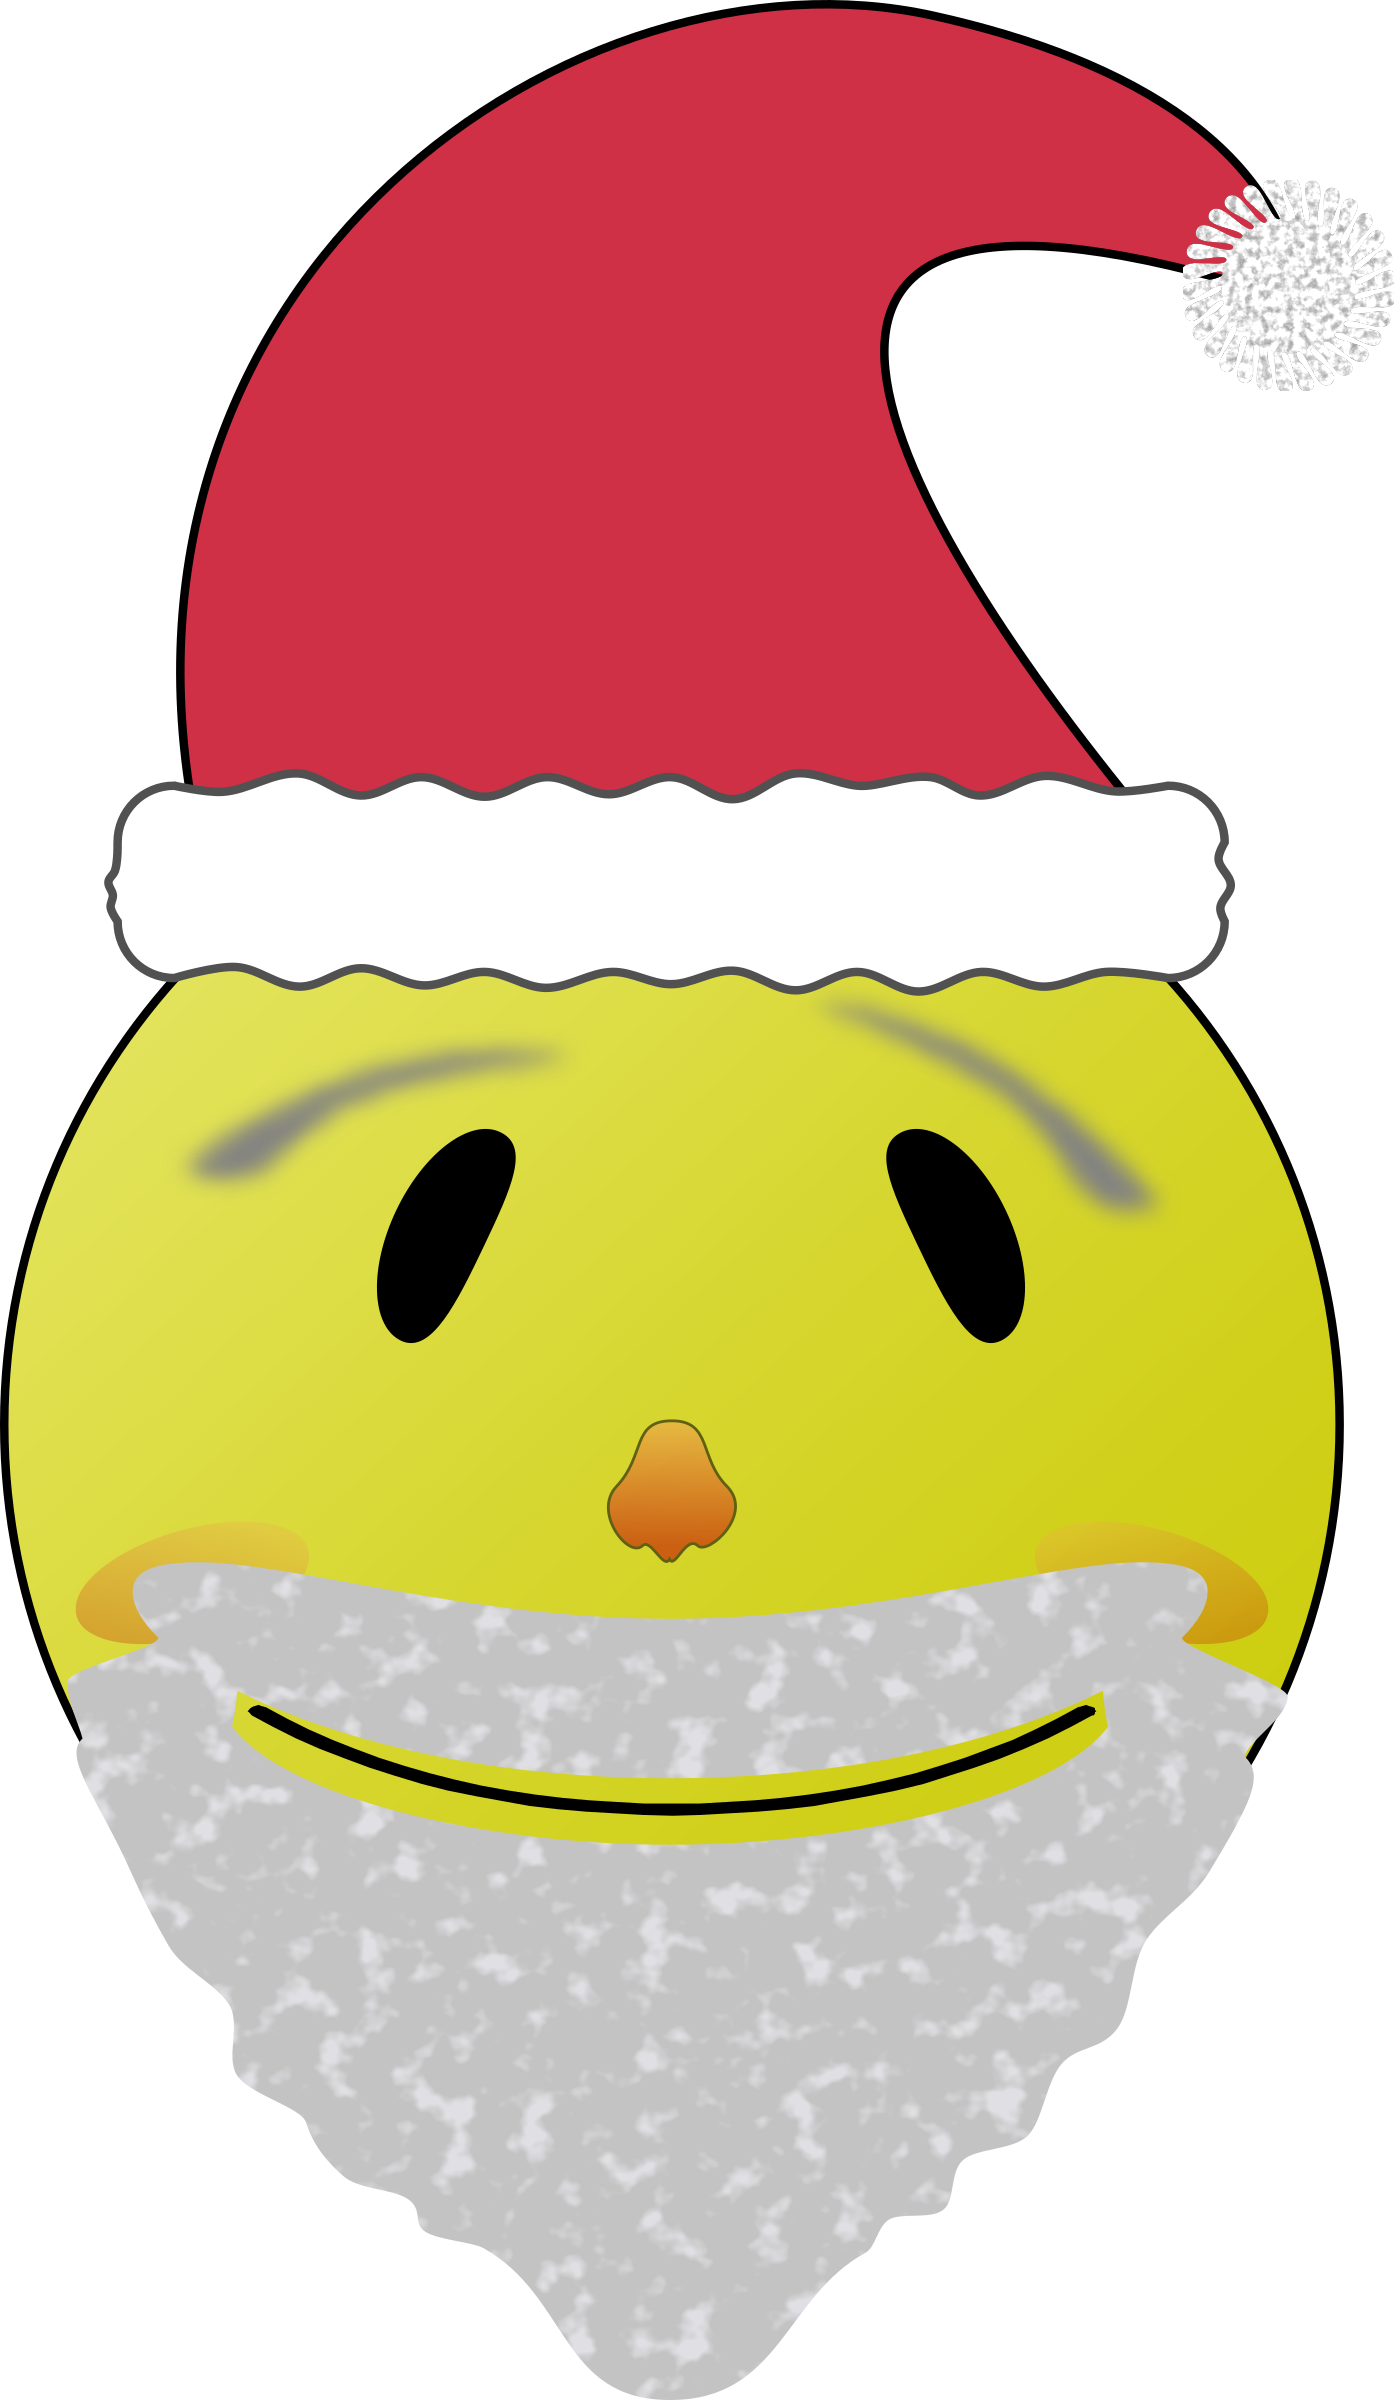 Free smiley cliparts download. Santa clipart basketball